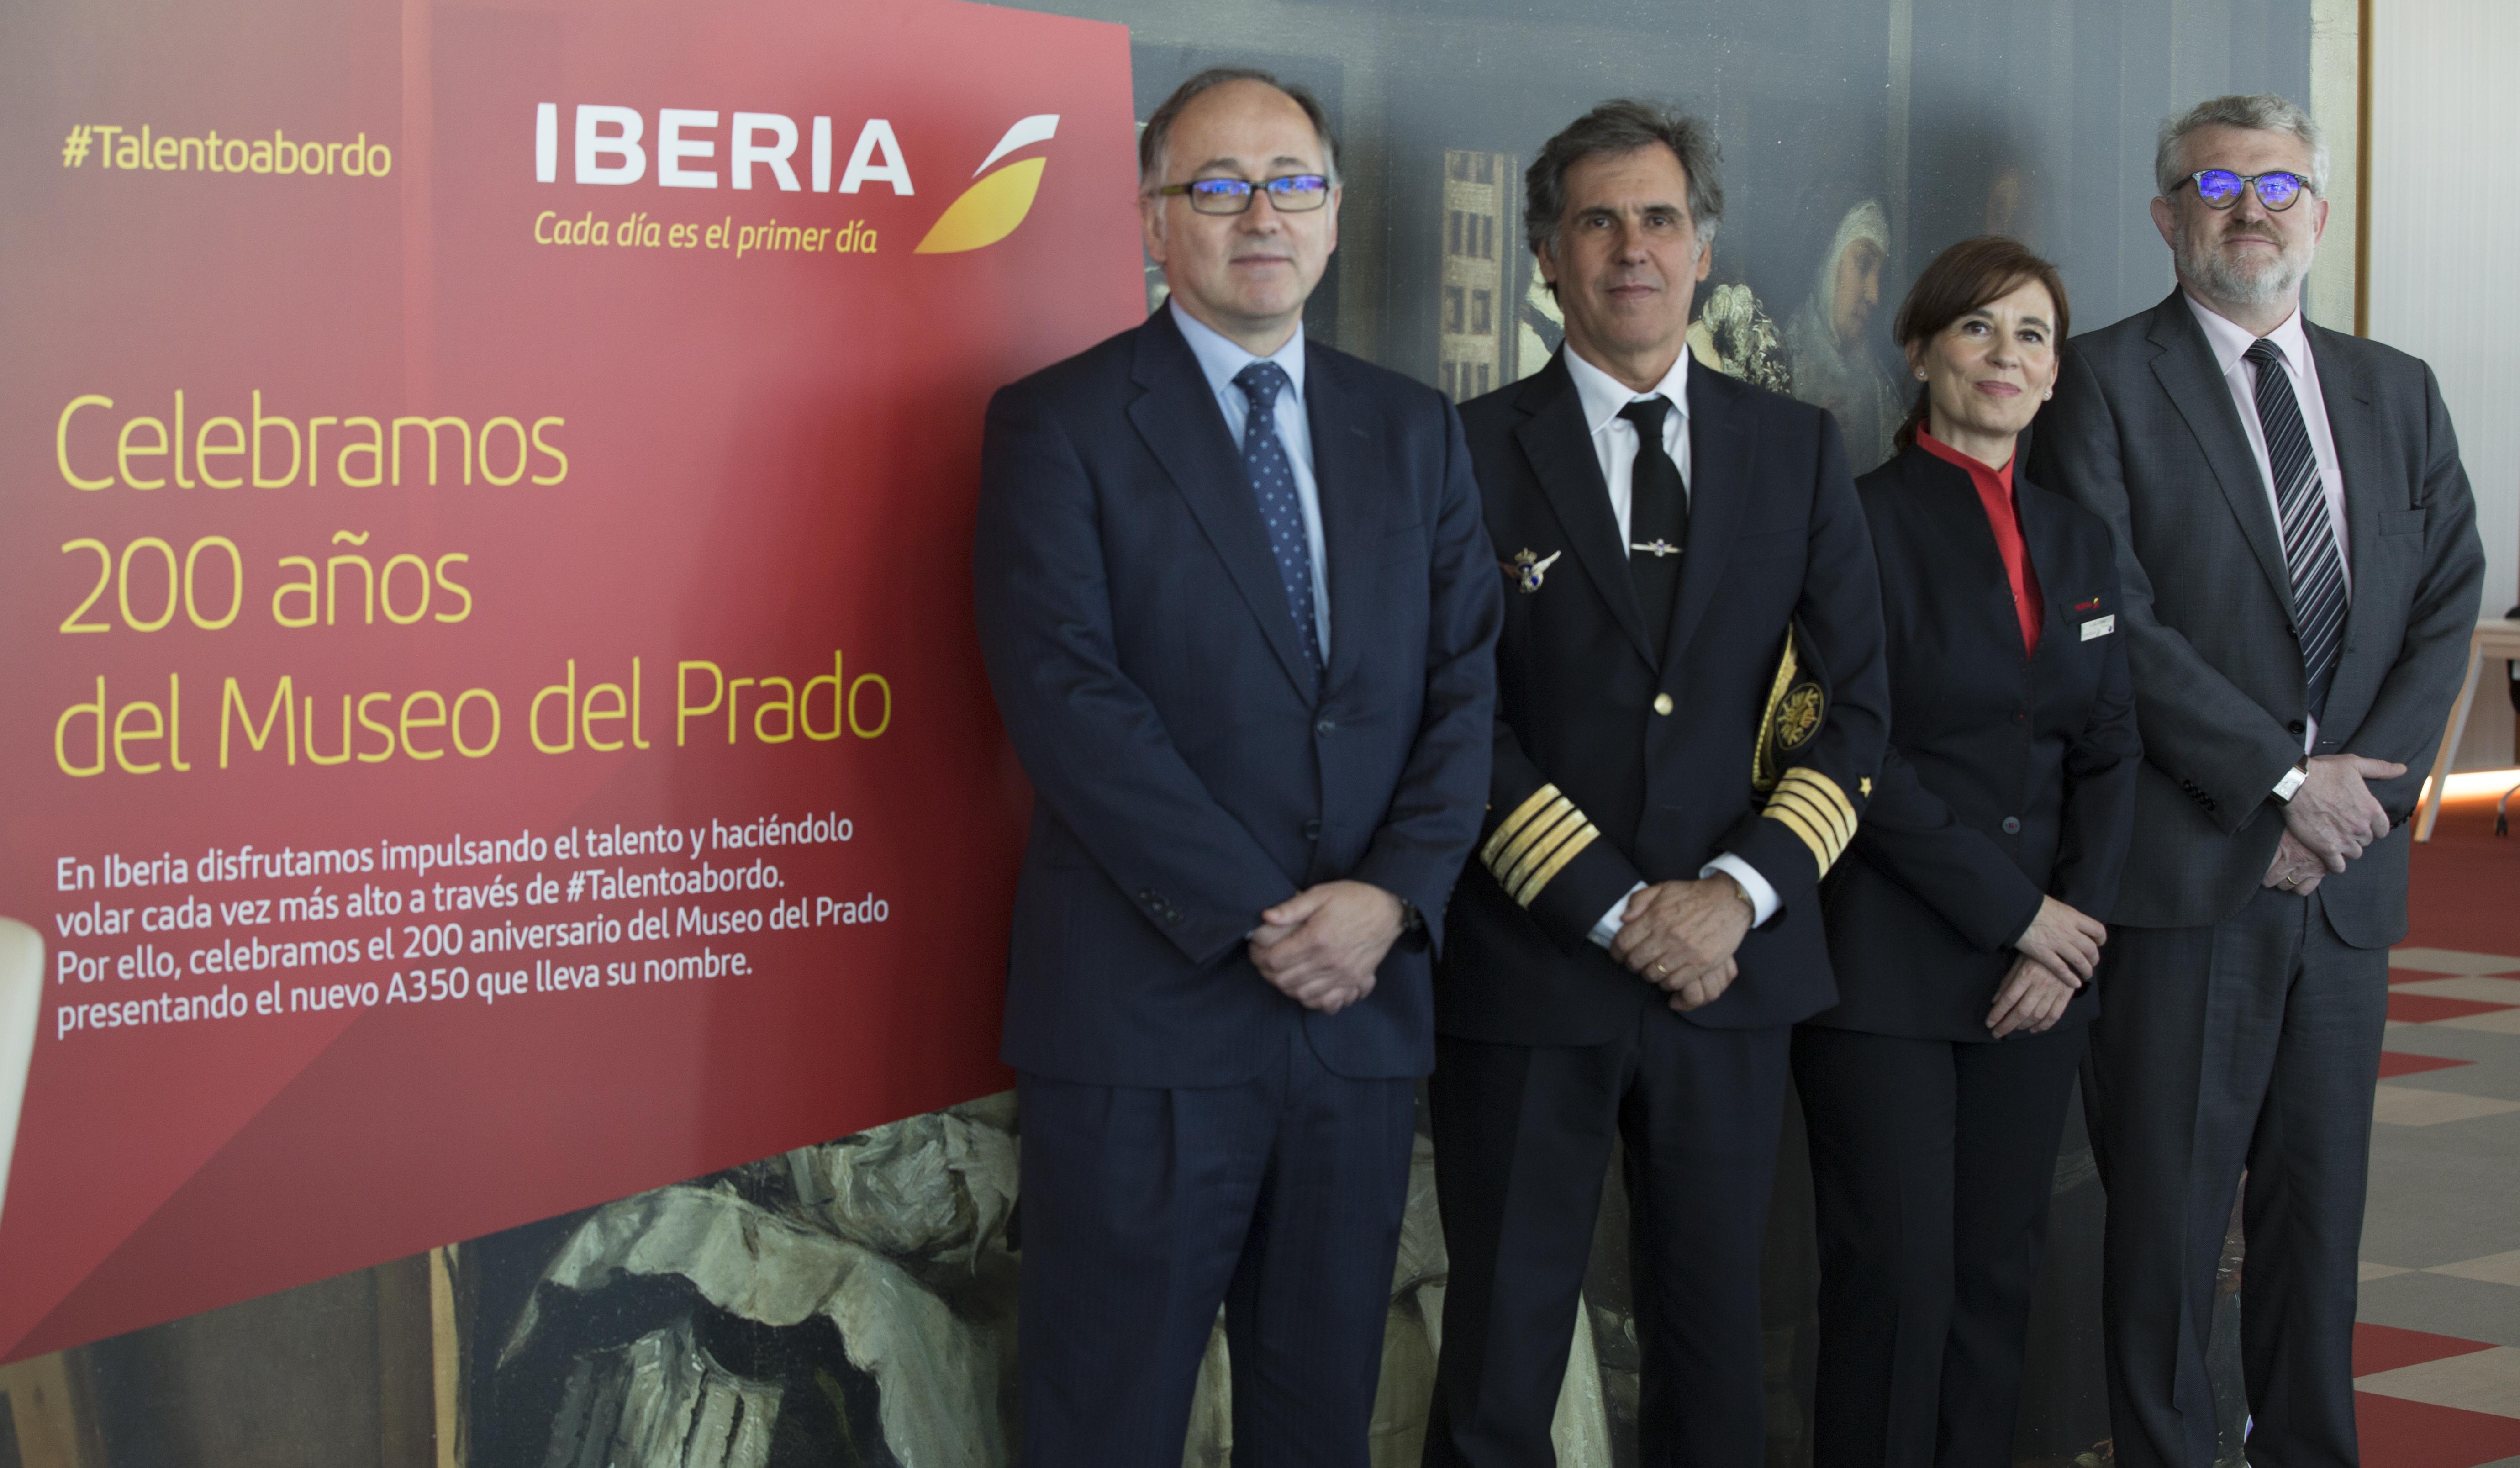 museo-del-prado_iberia-1